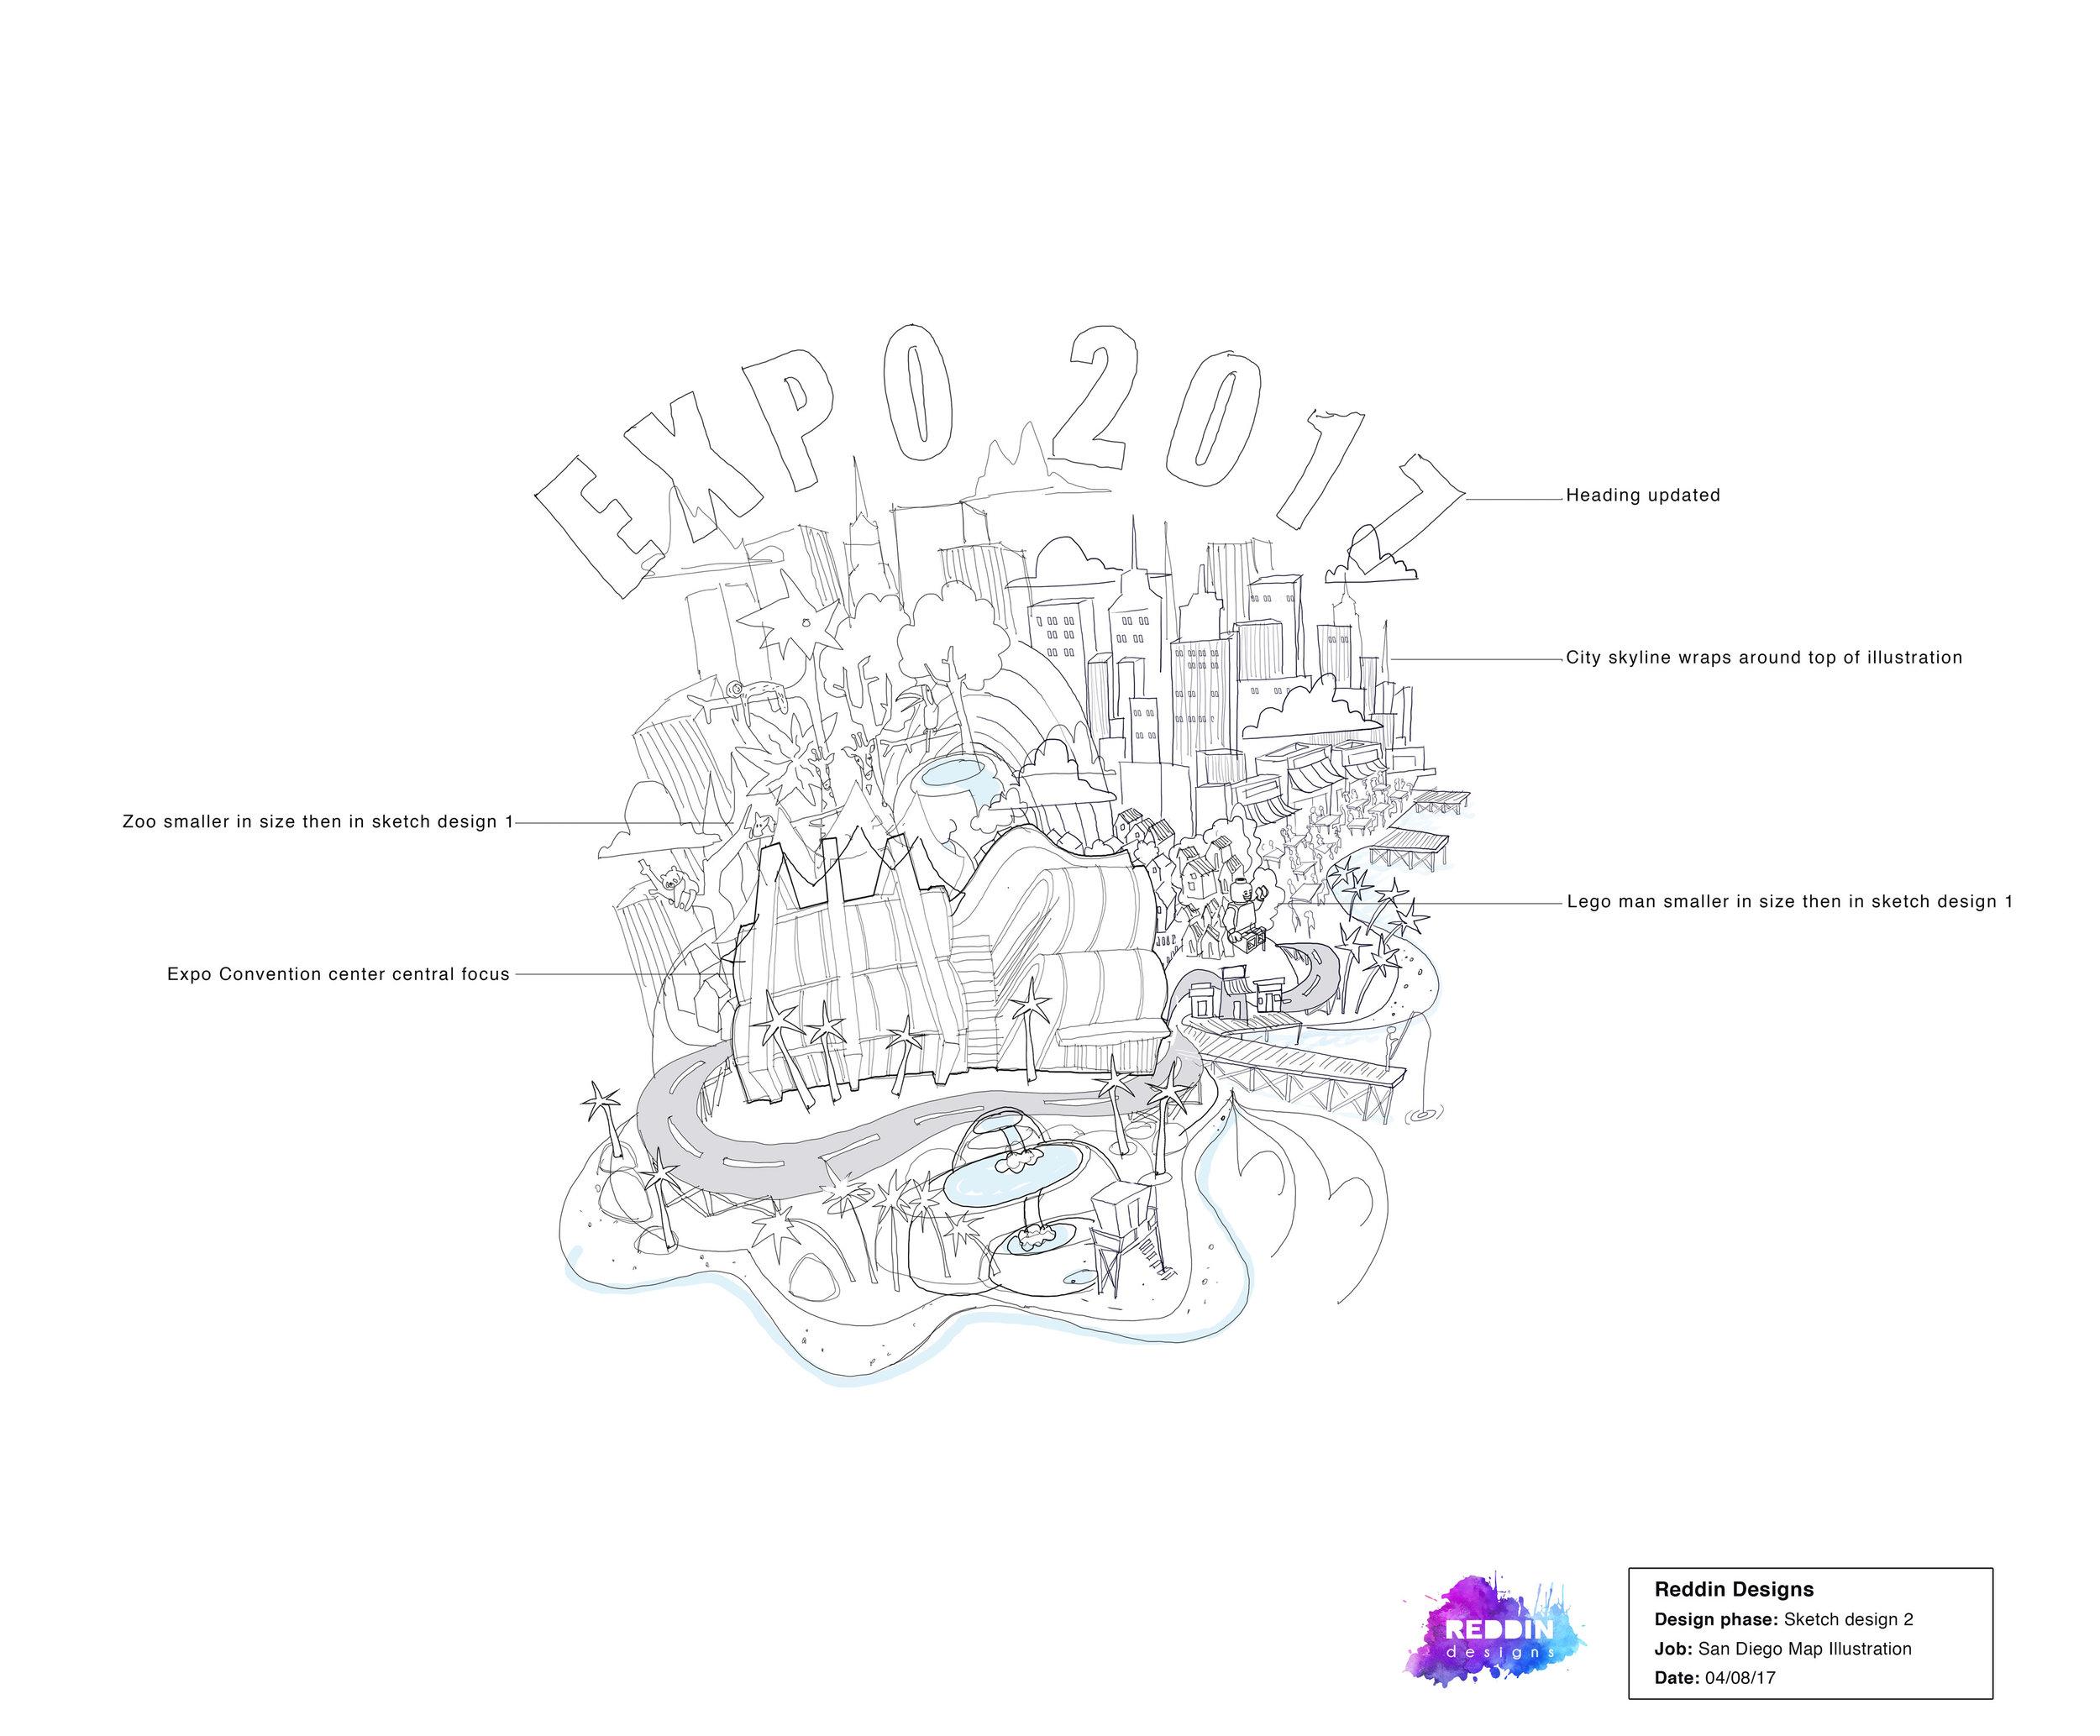 reddin designs Sketch-design-2-San-diego-illustration.jpg